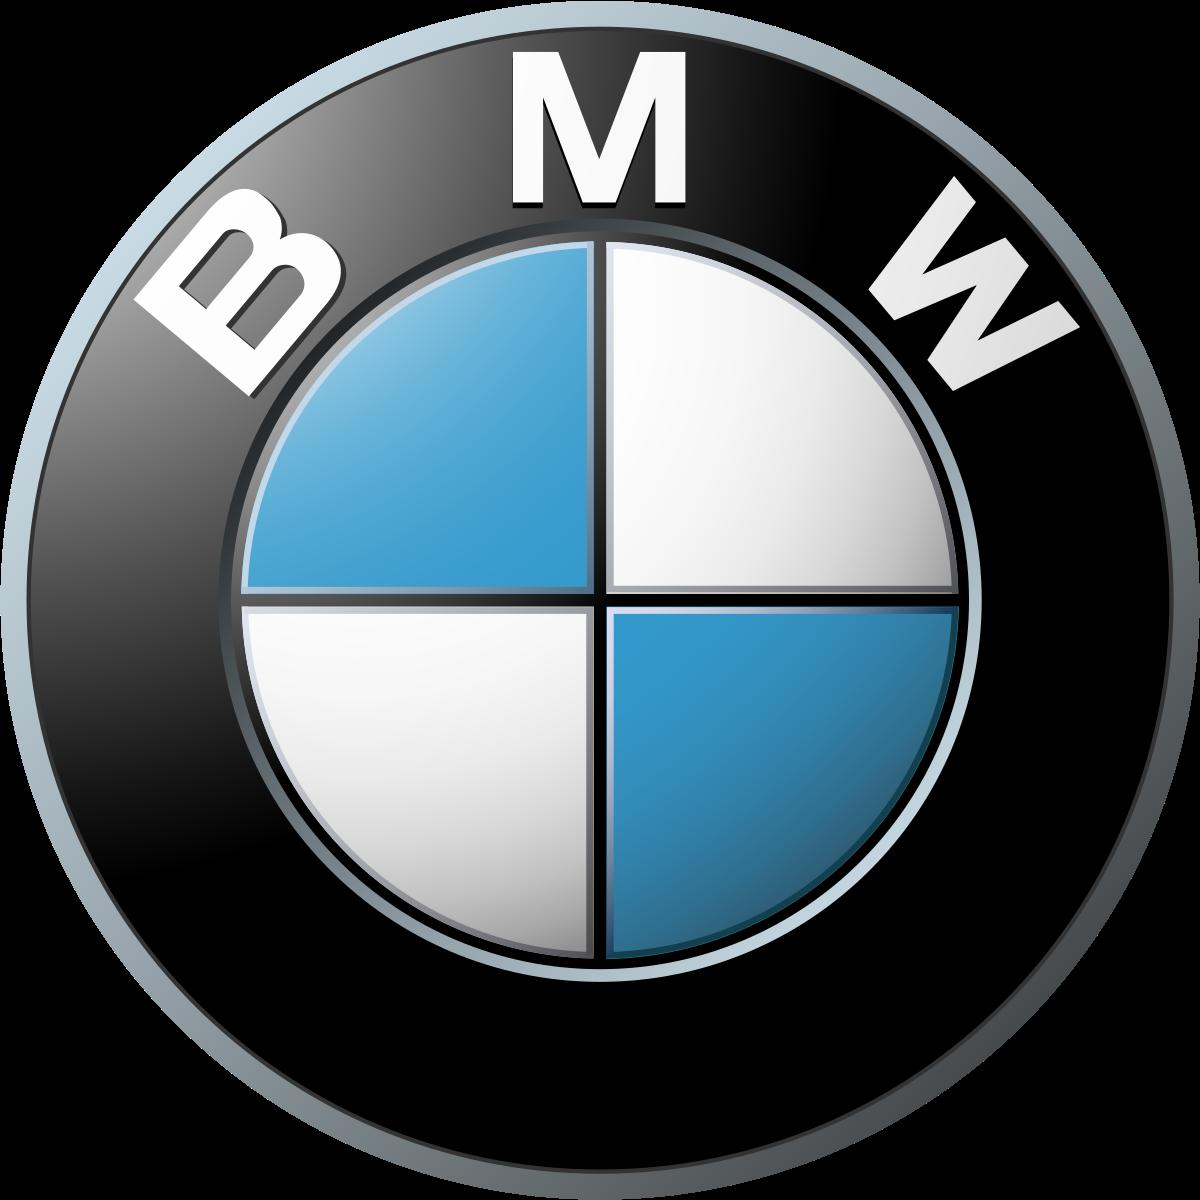 BMW Fondant Cutter Set